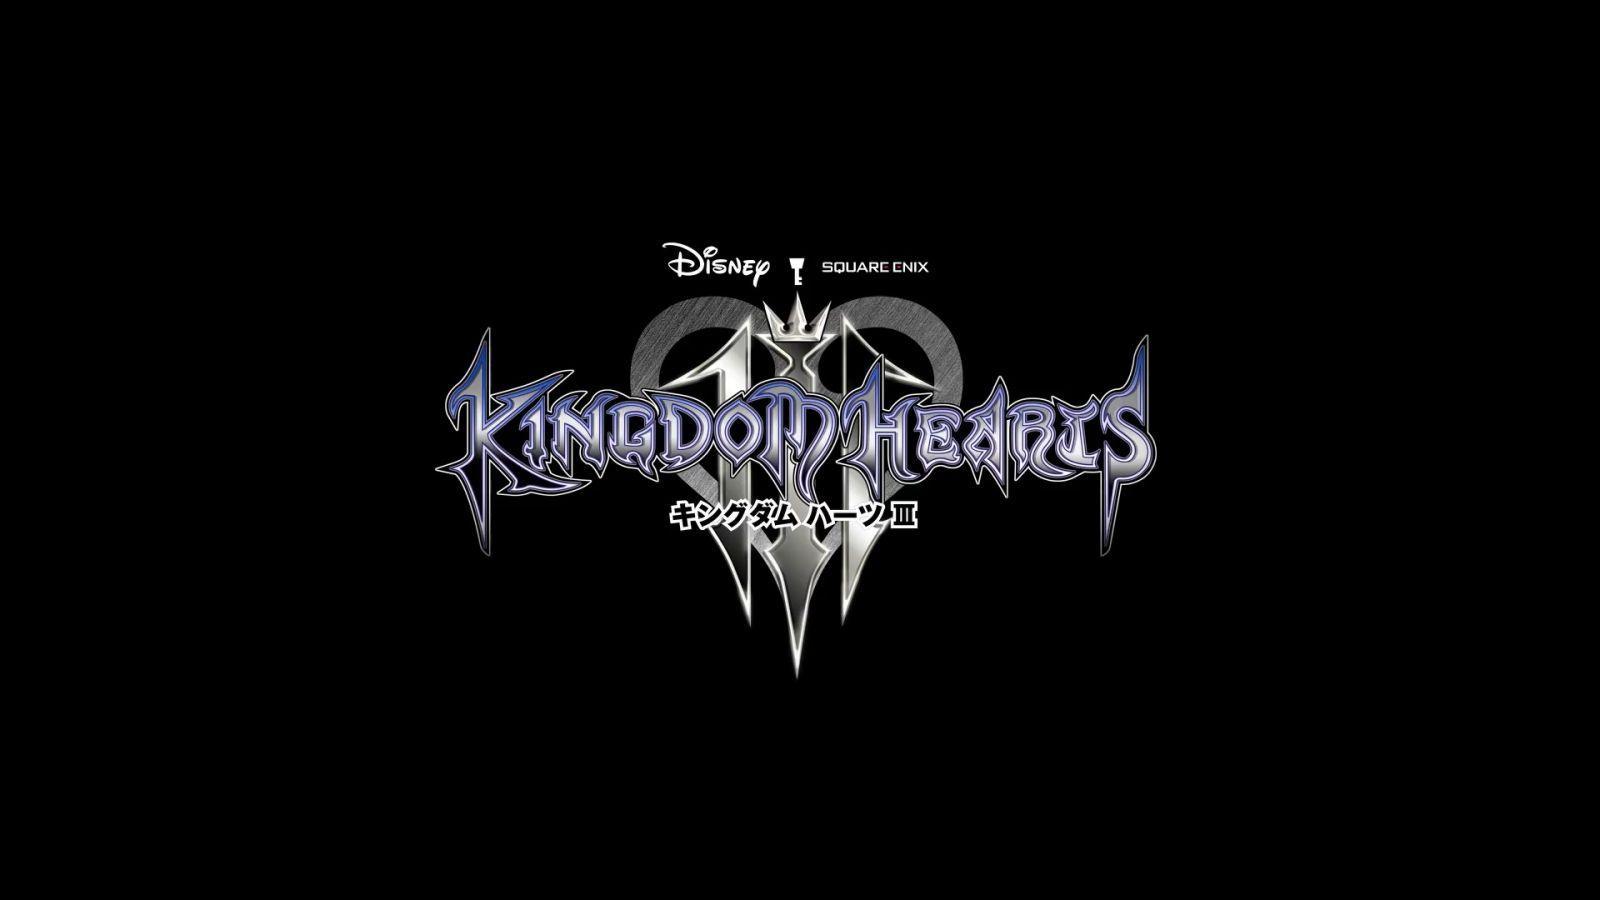 【KINGDOM HEARTS III】E3 2018 Trailer vol.2 490.jpg